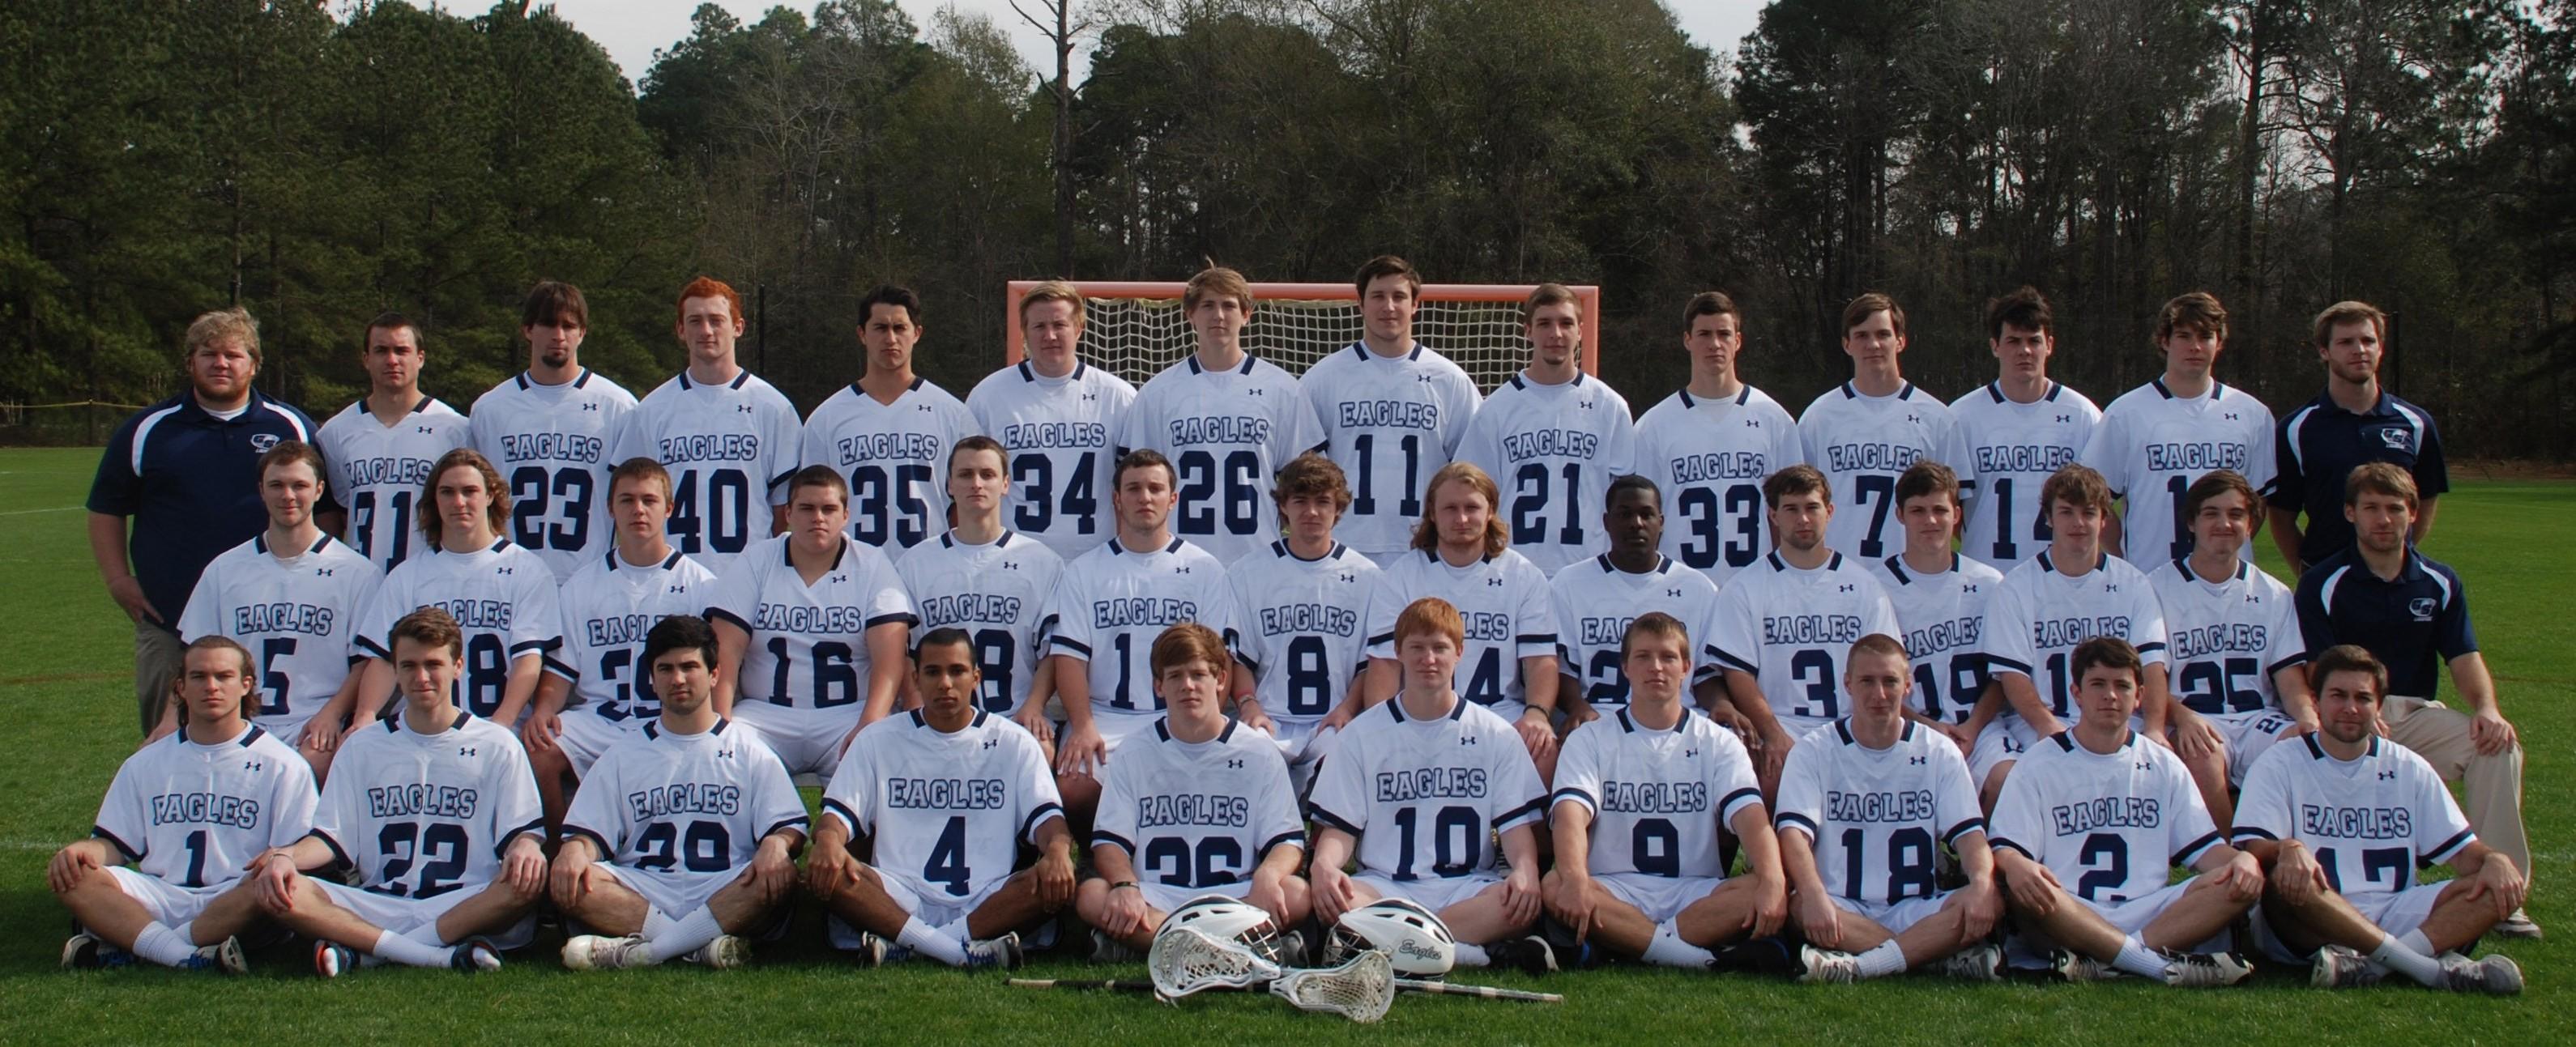 Eagles Lacrosse